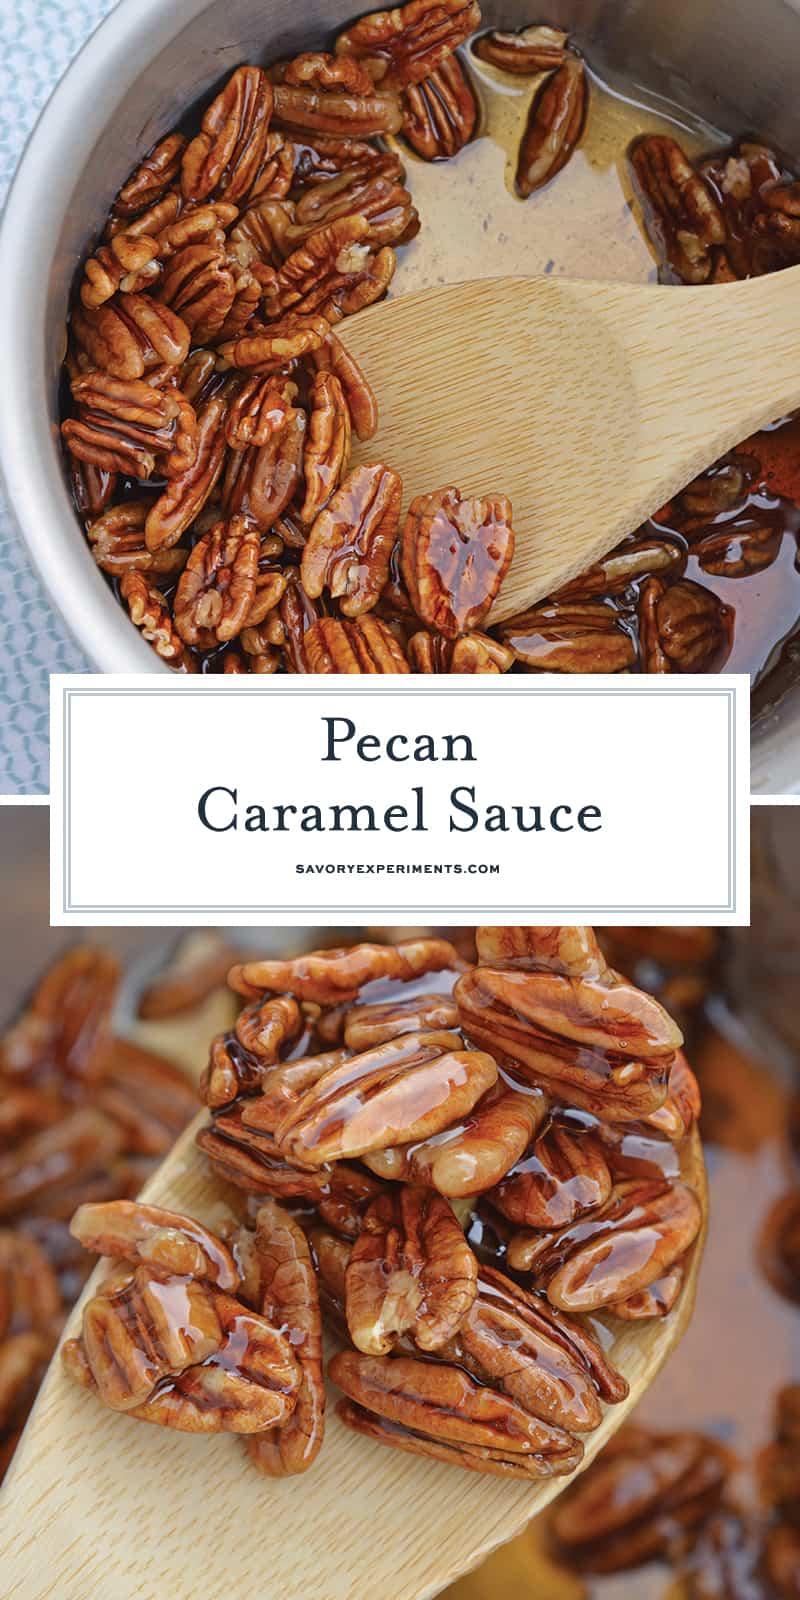 Caramel Pecan Sauce in saucepan